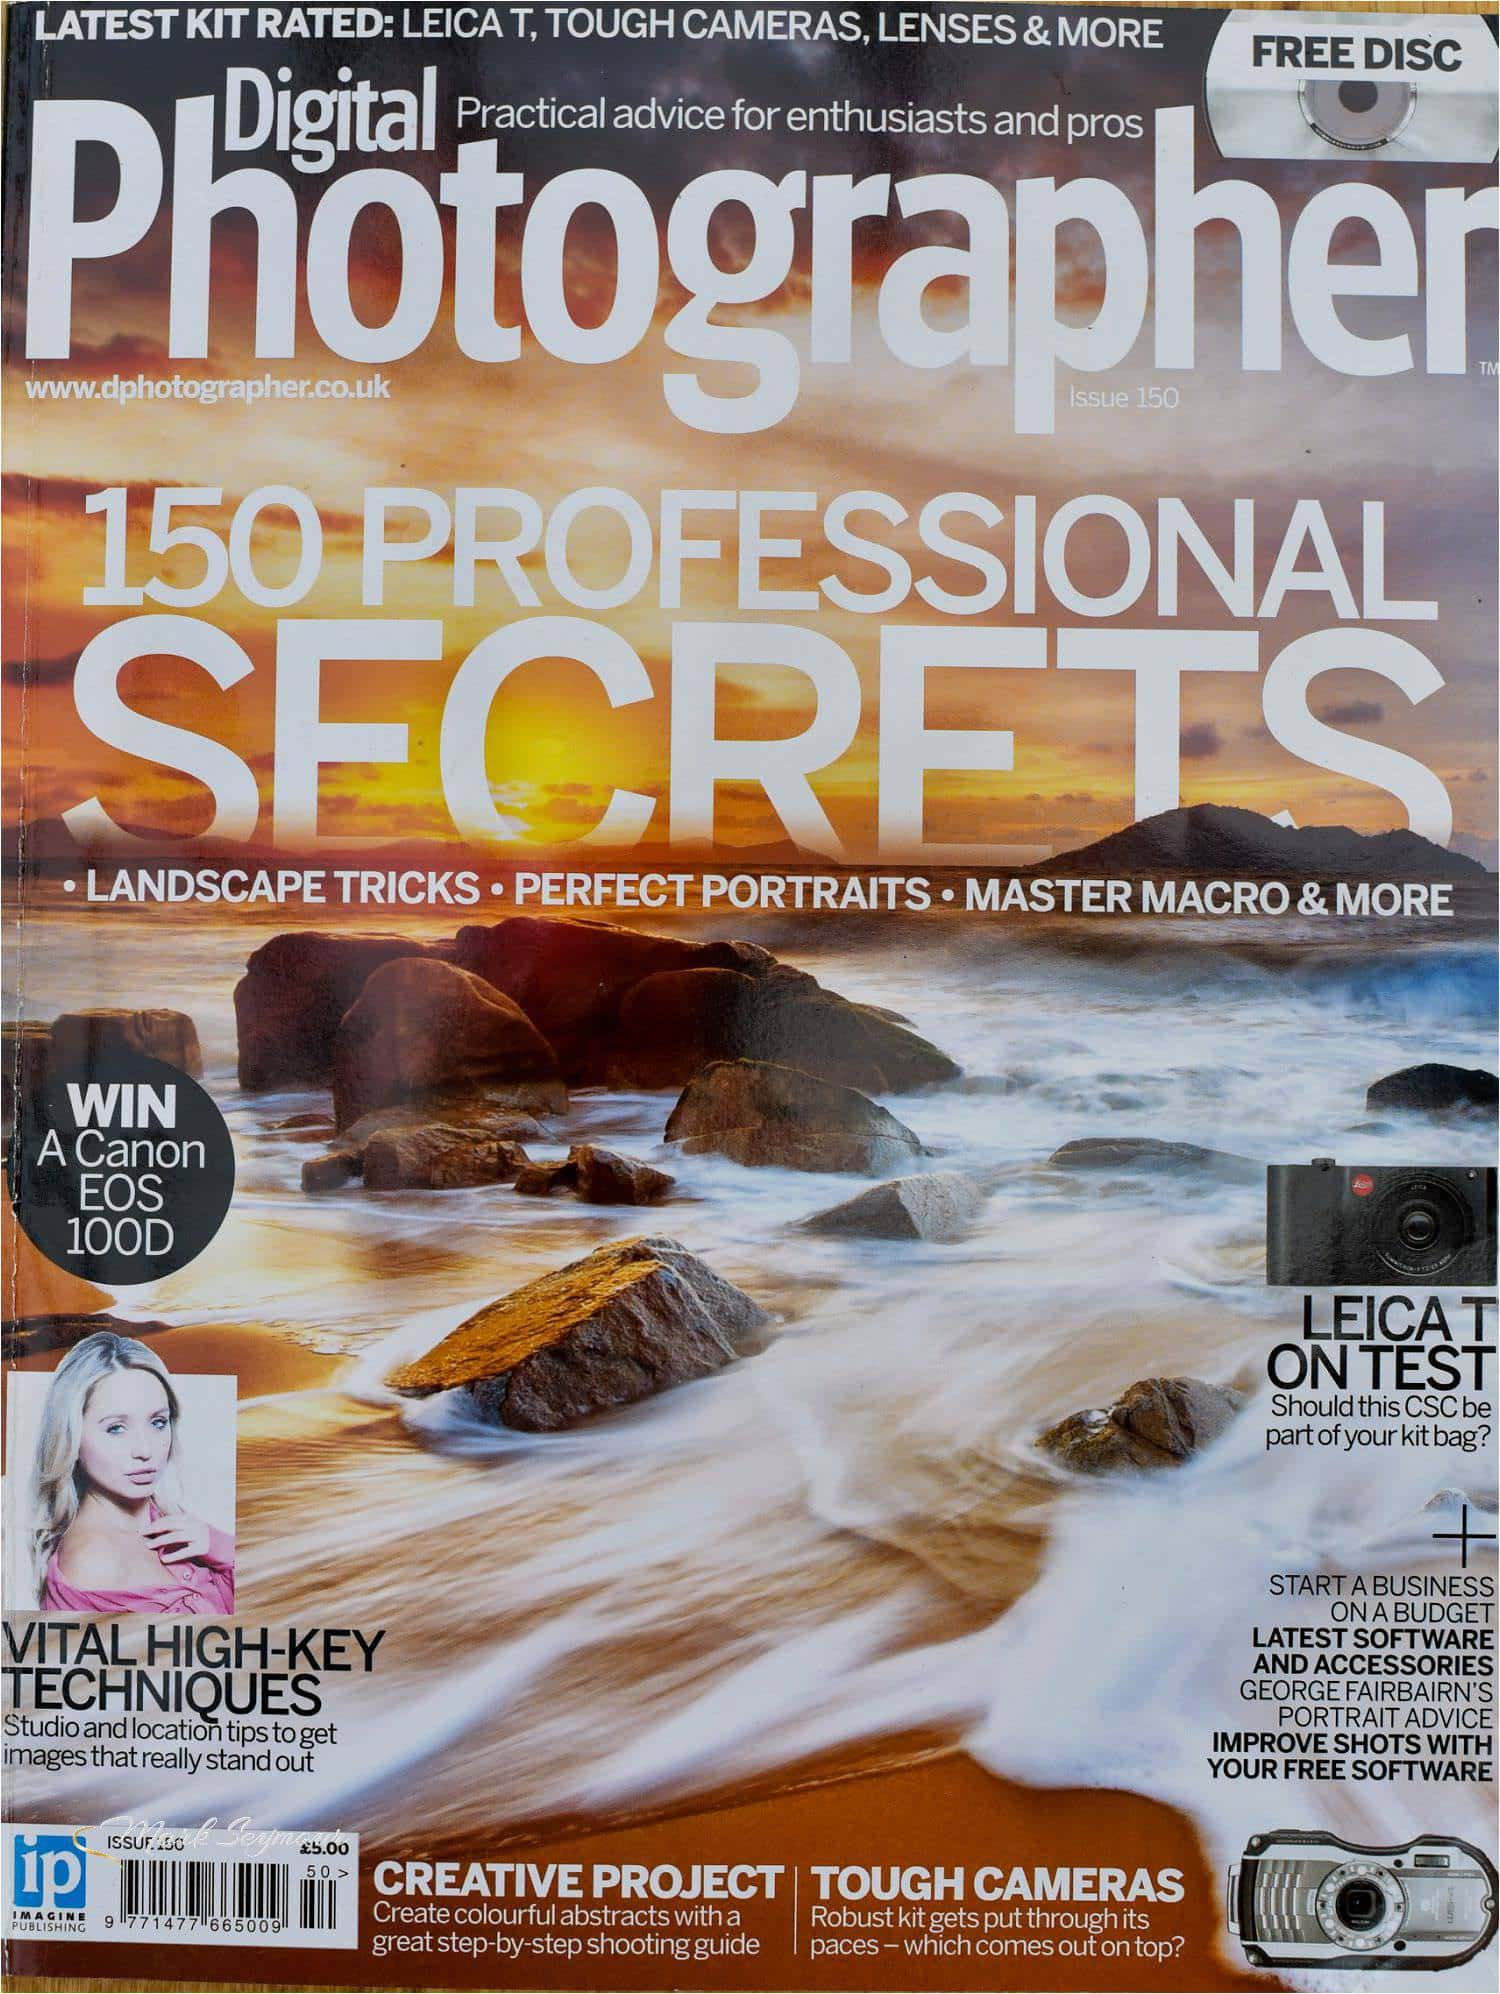 Digital Photographer with Mark Seymou